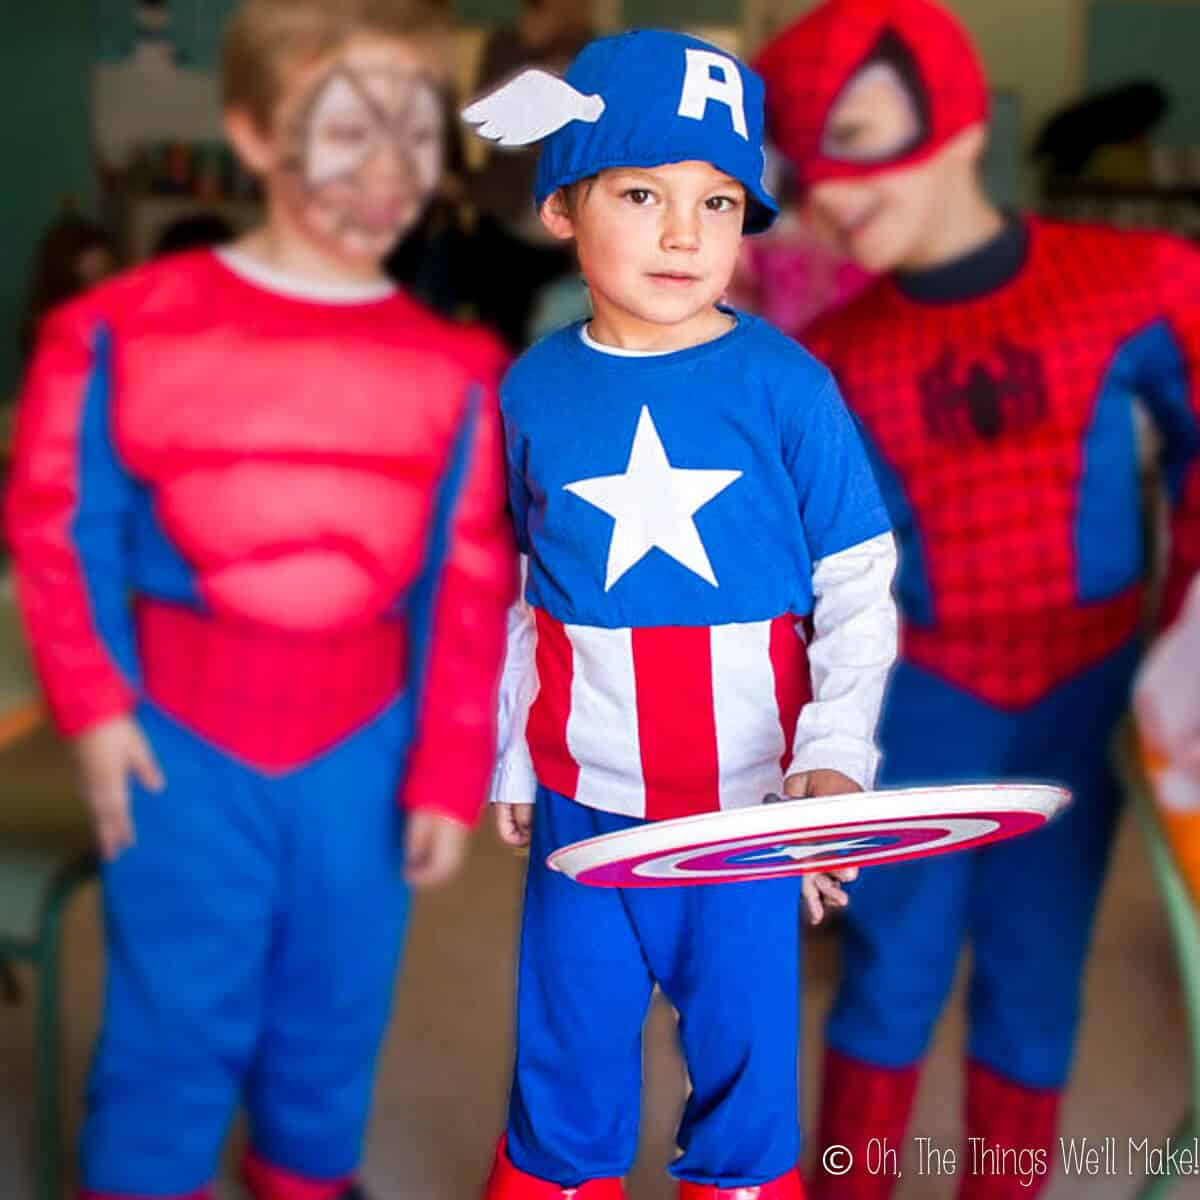 kids in superhero costumes focusing on boy in homemade Captain America costume